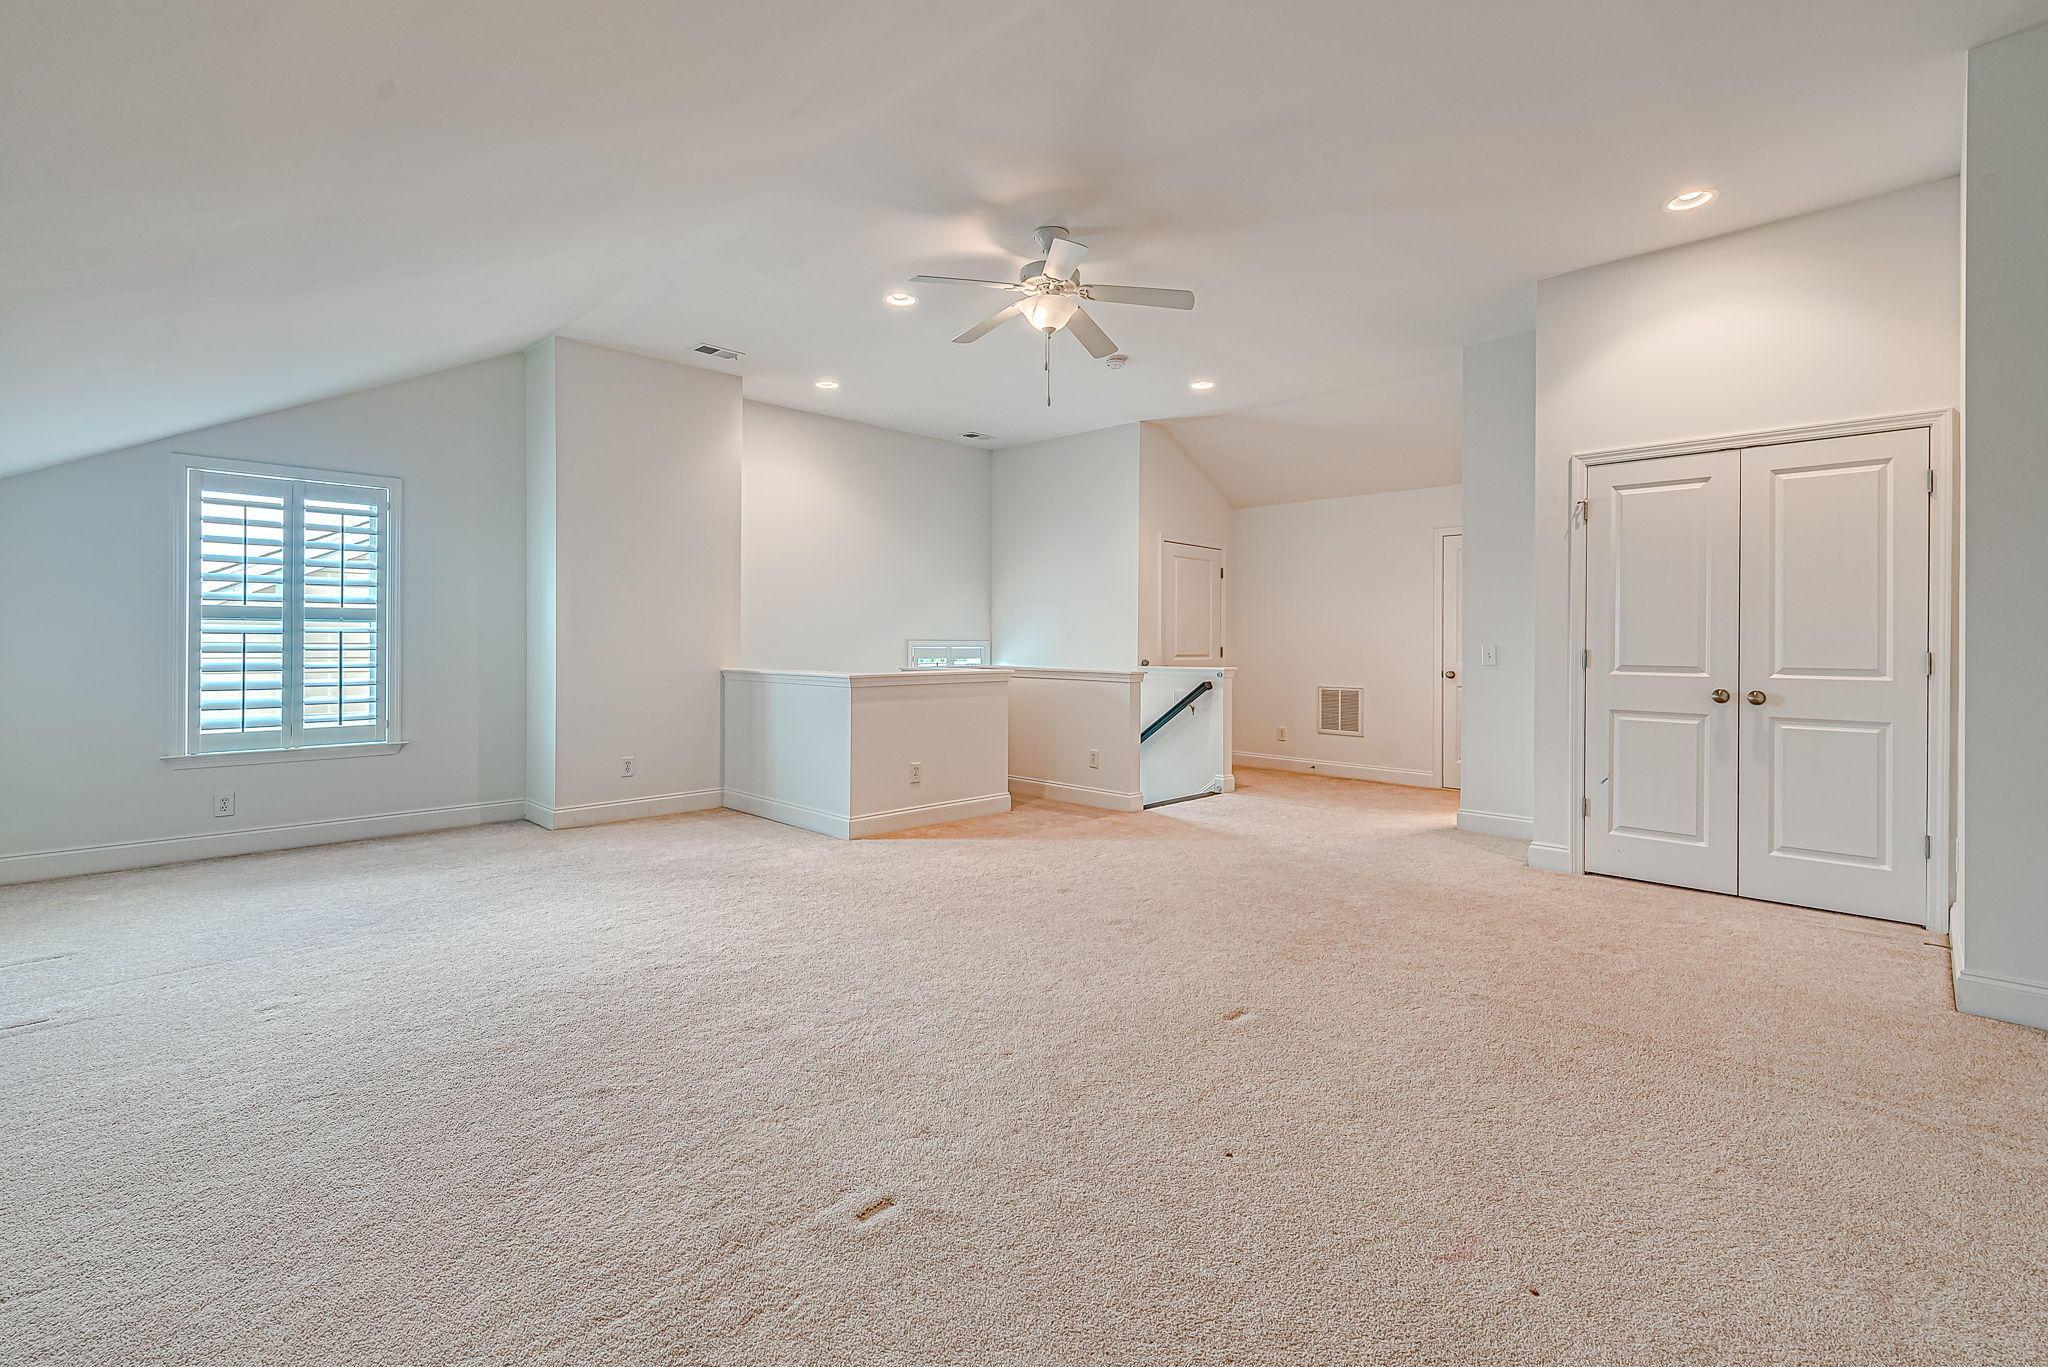 Dunes West Homes For Sale - 2476 Kings Gate, Mount Pleasant, SC - 29